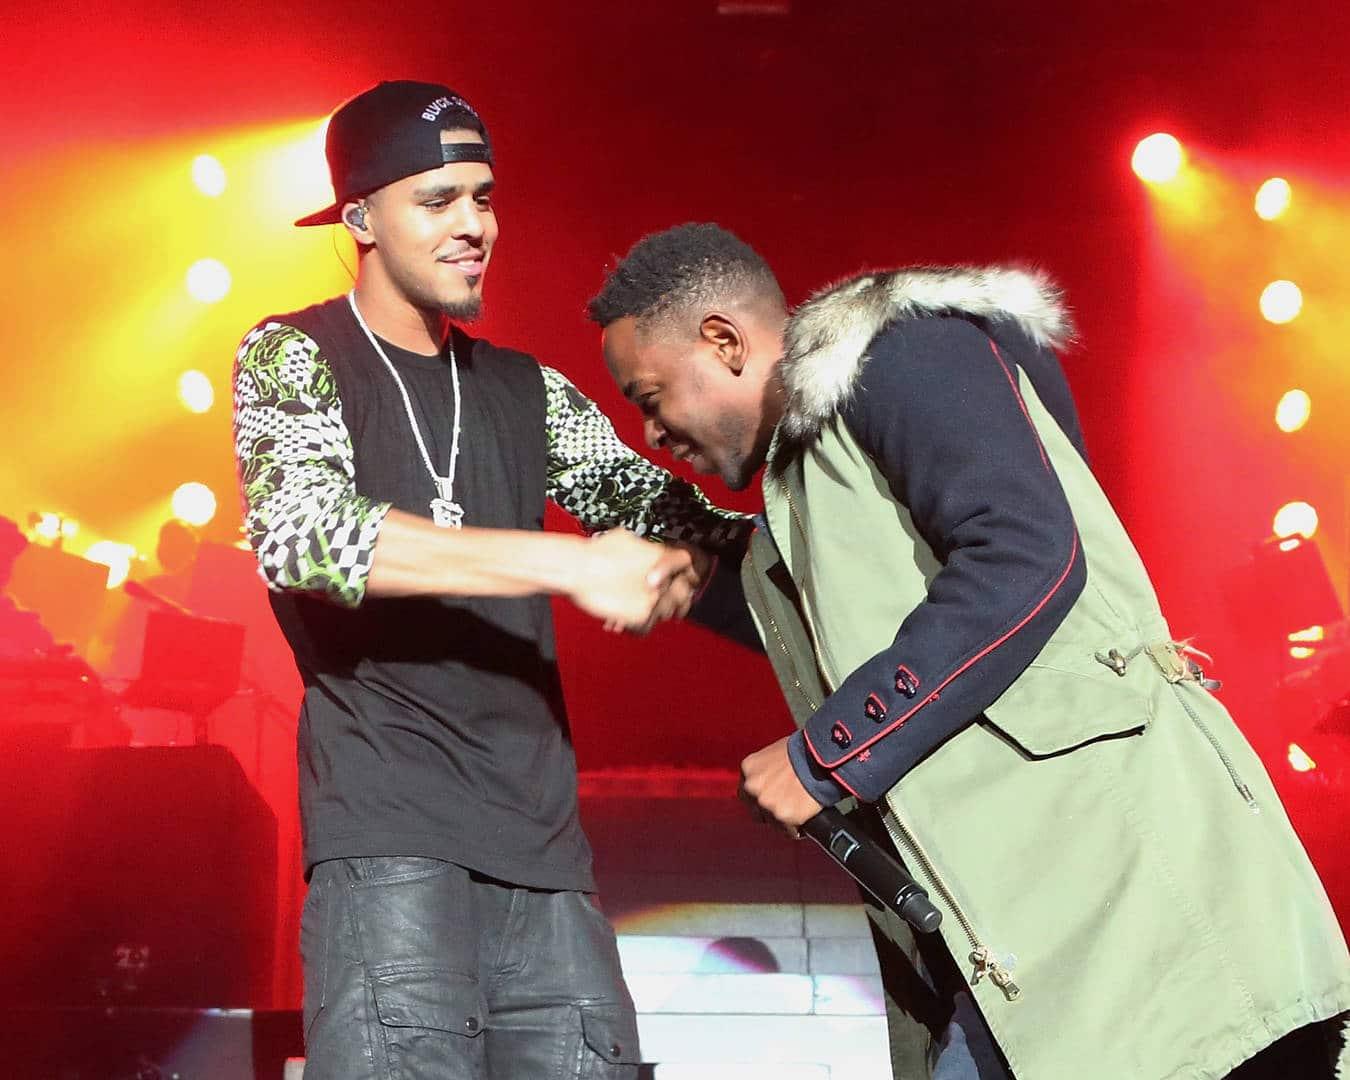 Mythical albums like Detox: J. Cole & Kendrick collab album